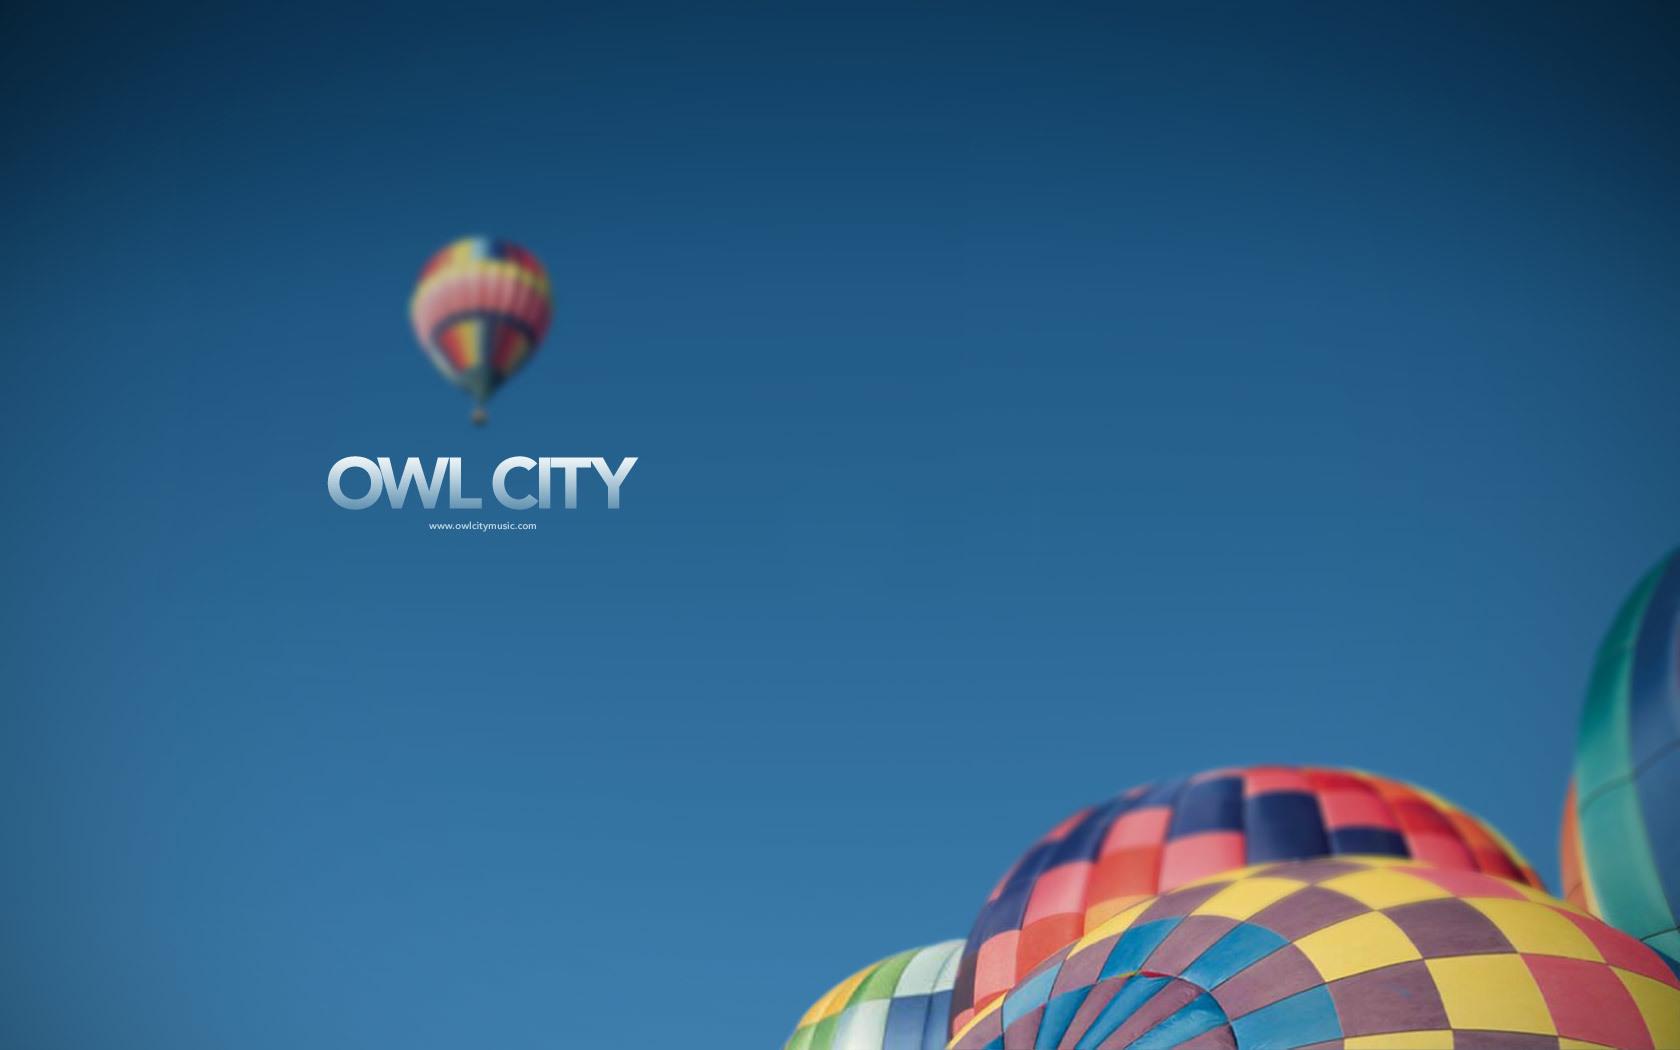 Owl+city+ocean+eyes+wallpaper